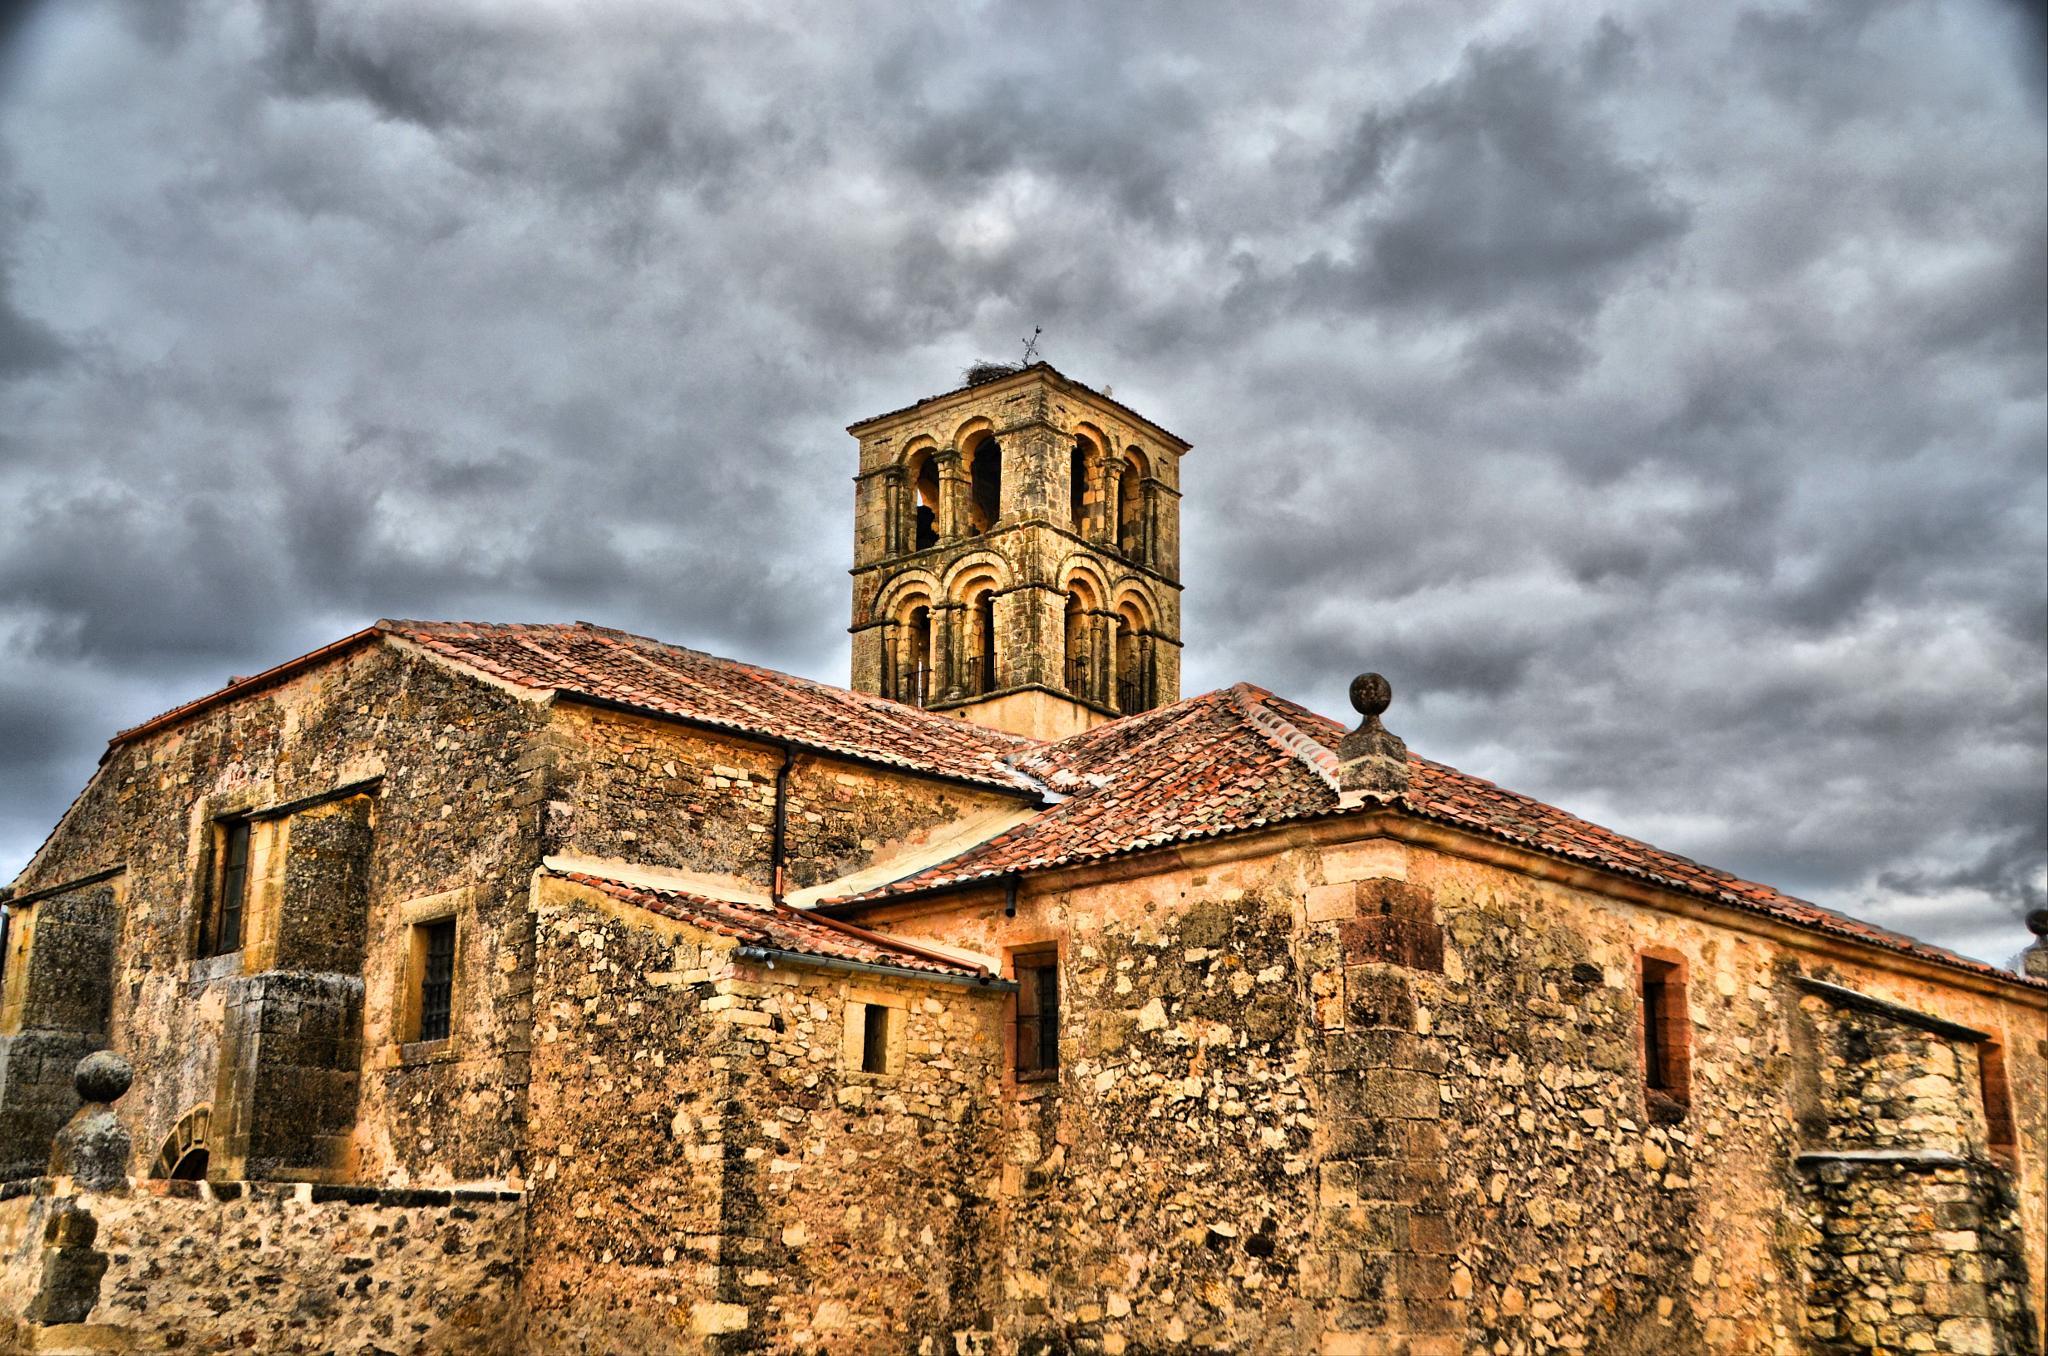 Pedraza 23 by Jorge Alonso